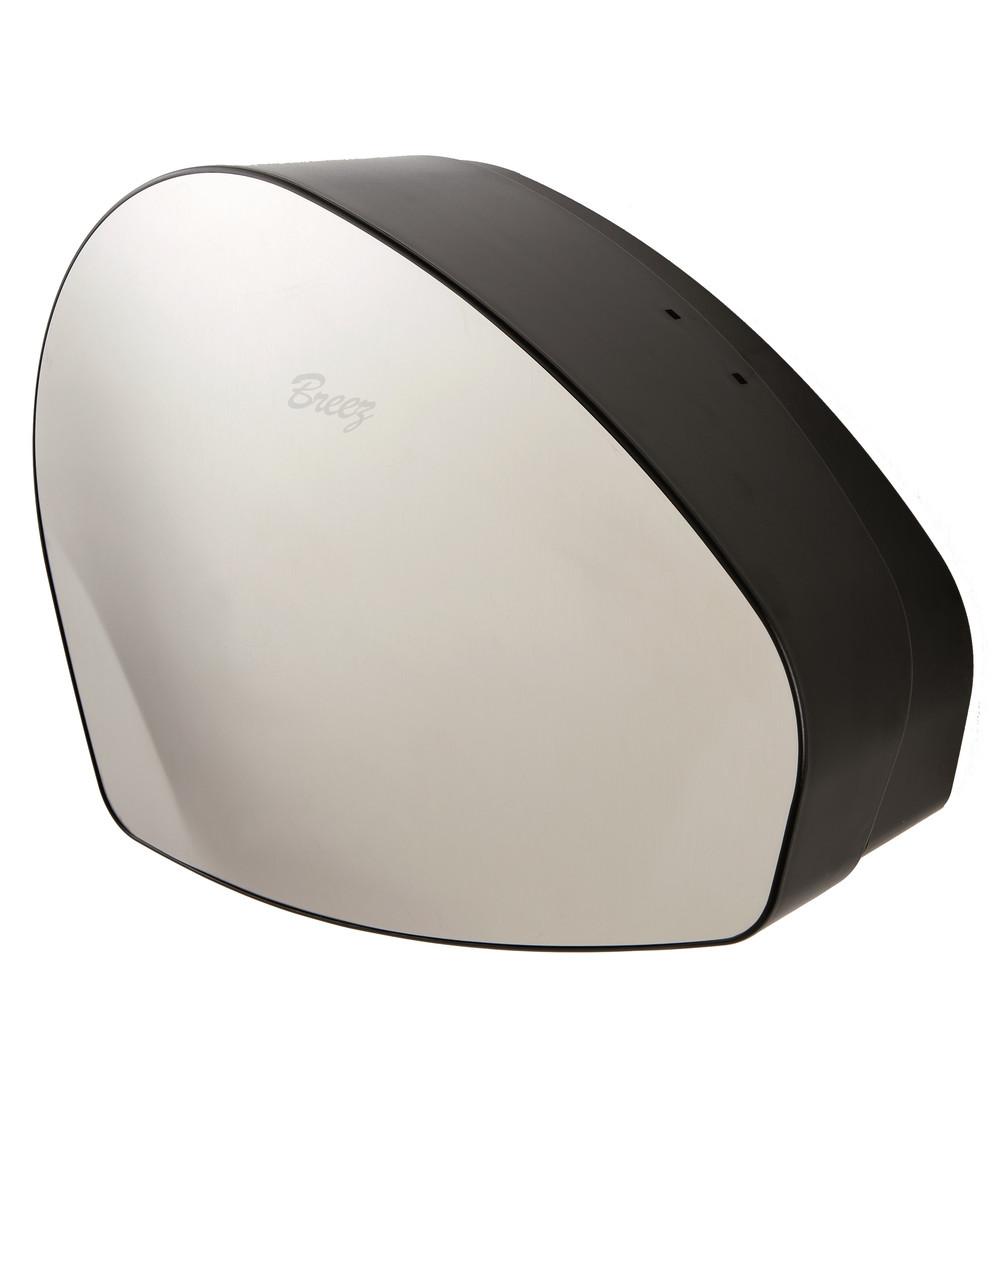 Breez Mercury Диспенсер для туалетной бумаги Jumbo